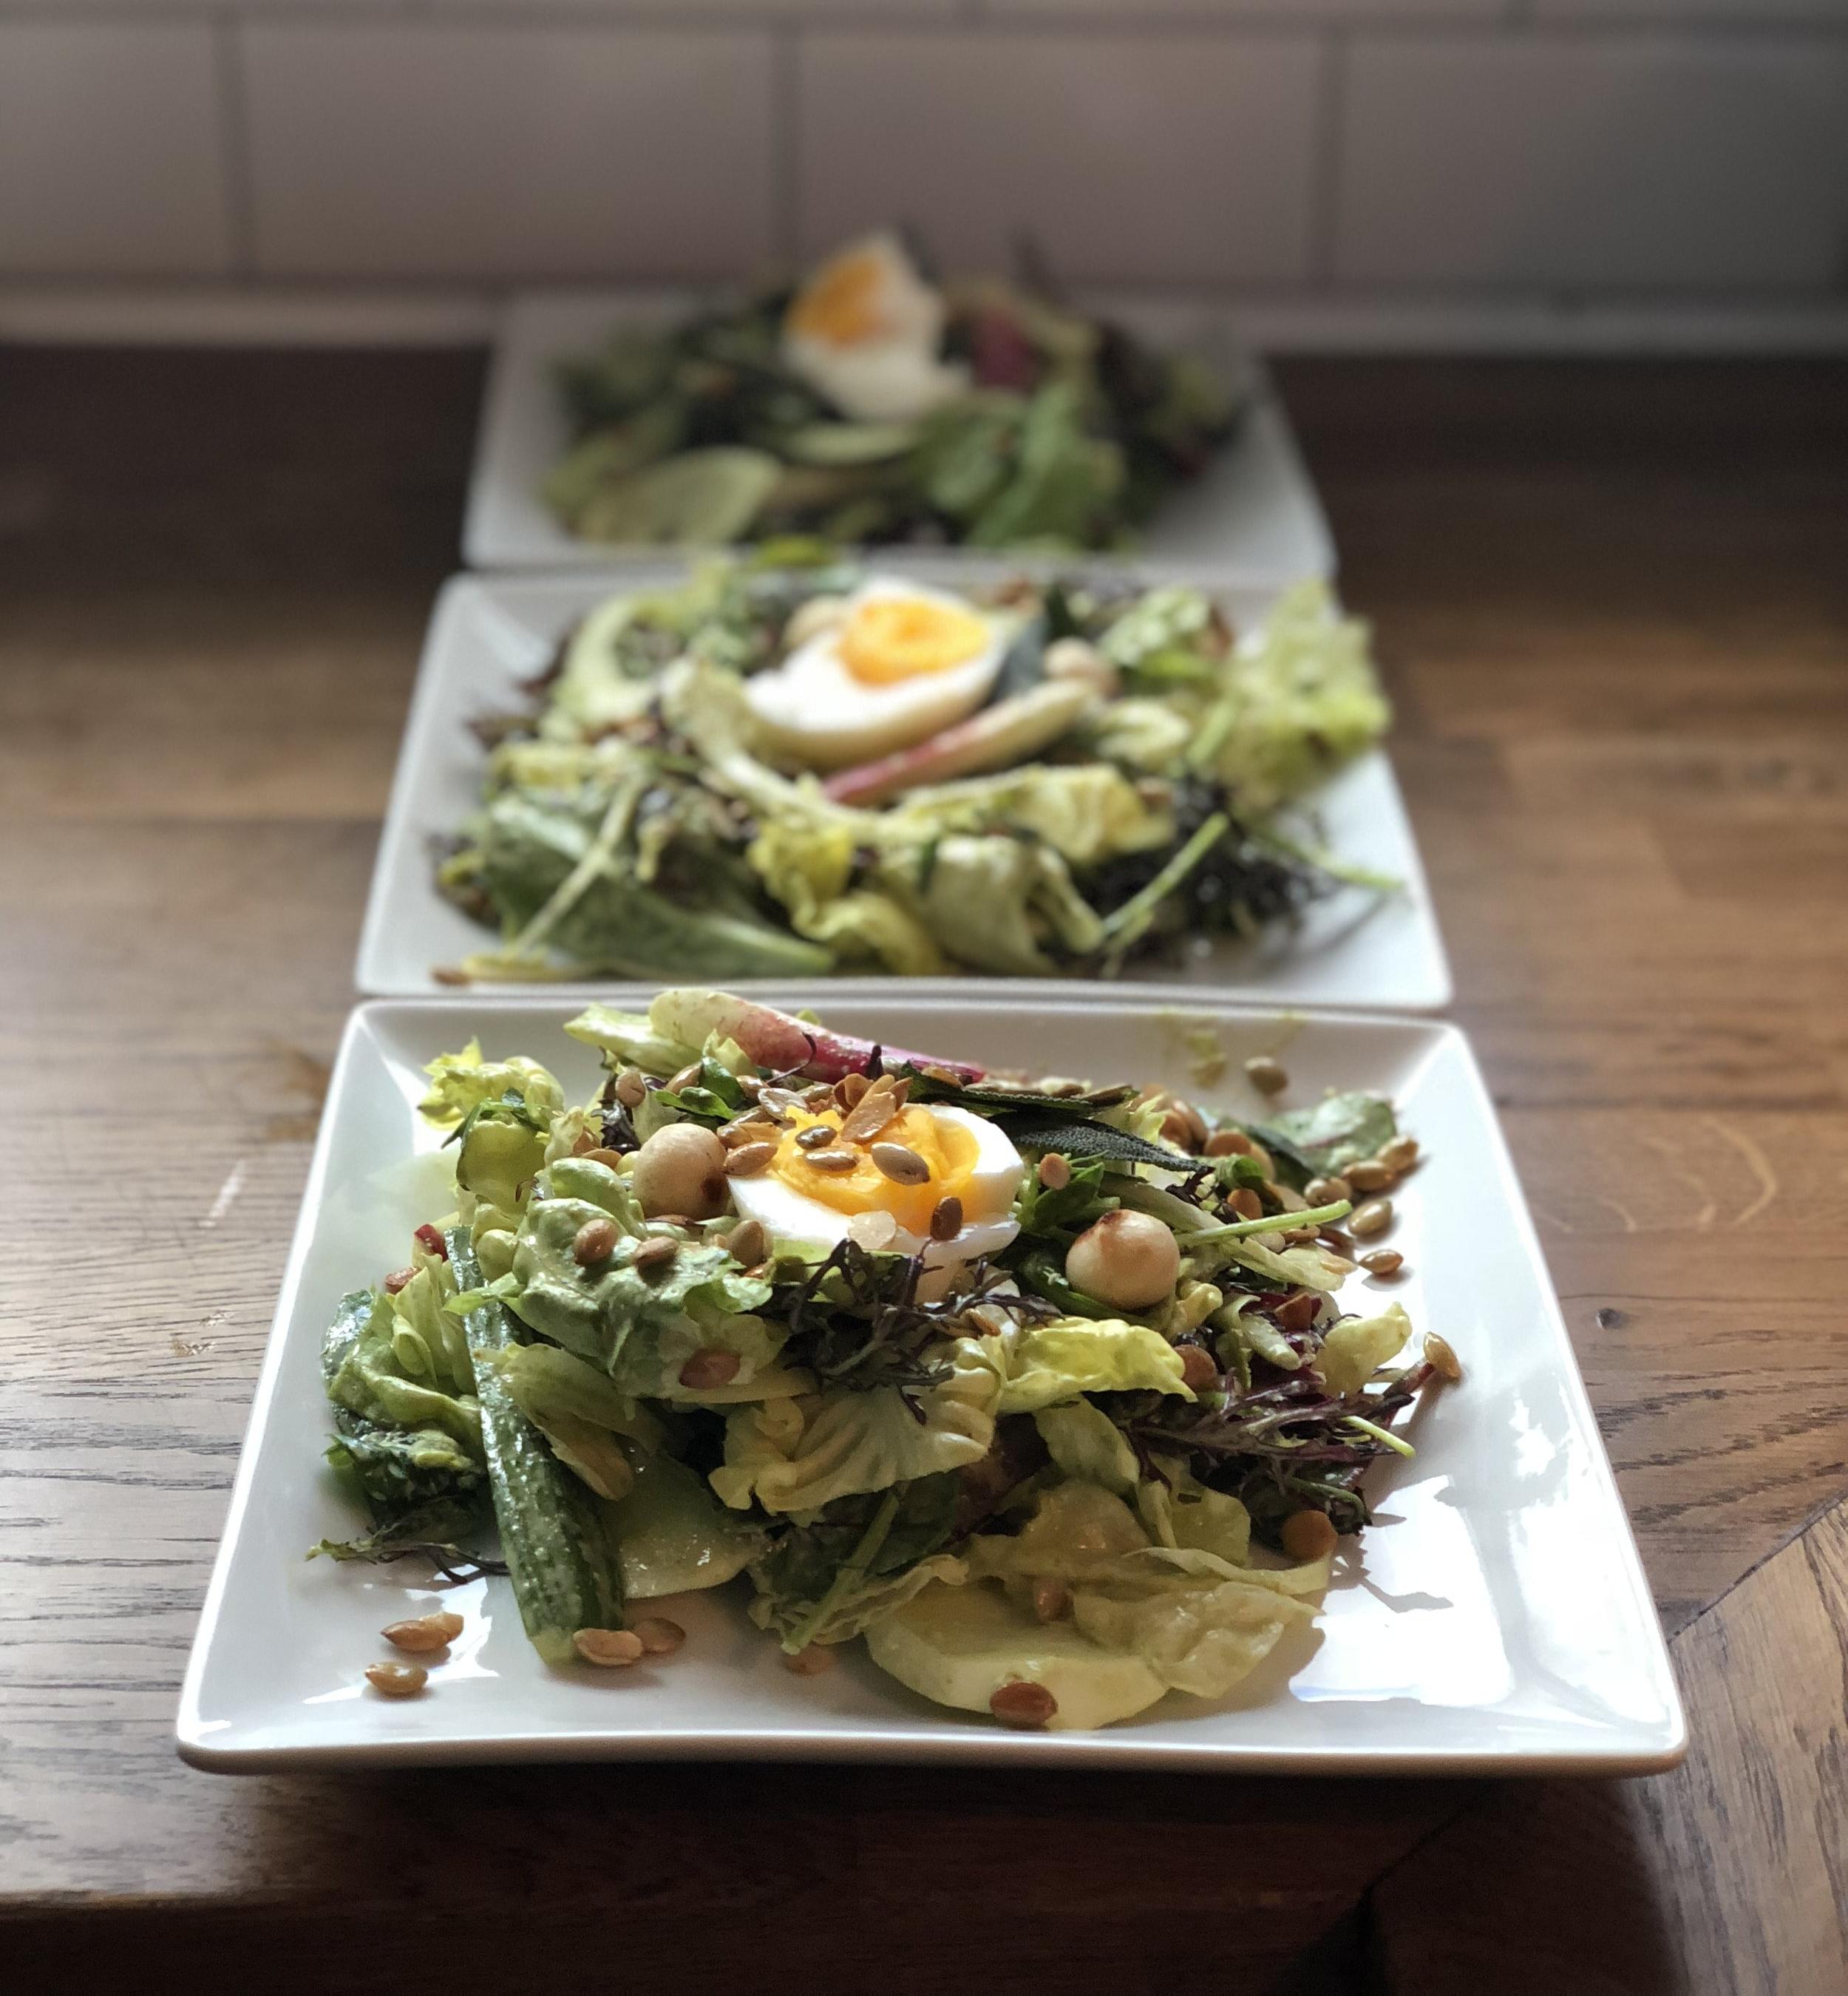 Farmers Market Salad & Fresh Basil Dressing